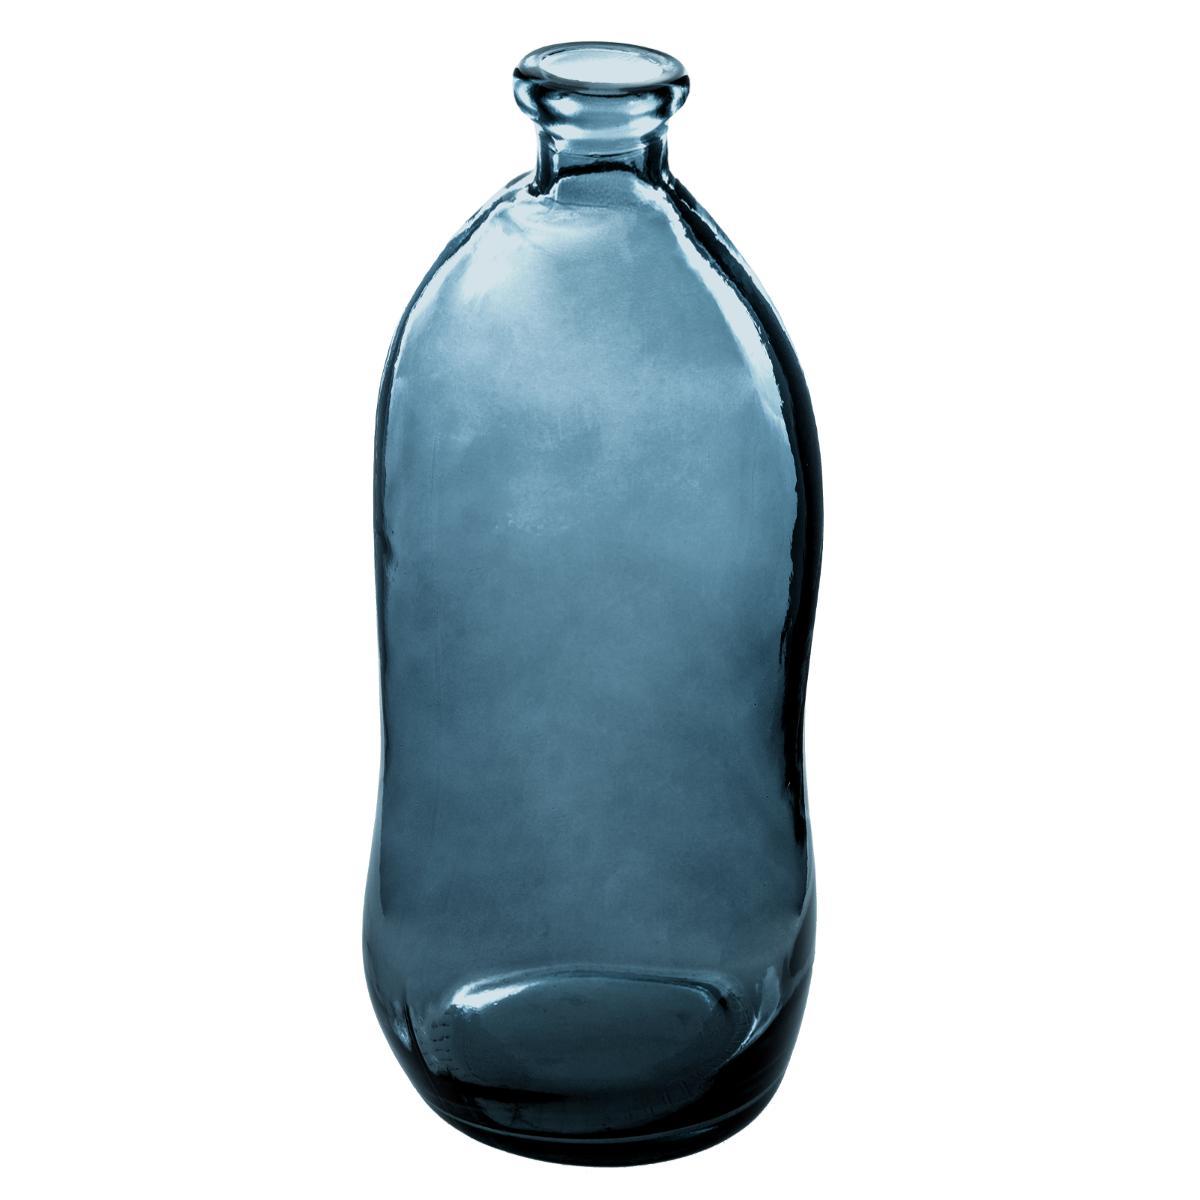 Vase bouteille verre recyclé H73 - Atmosphera